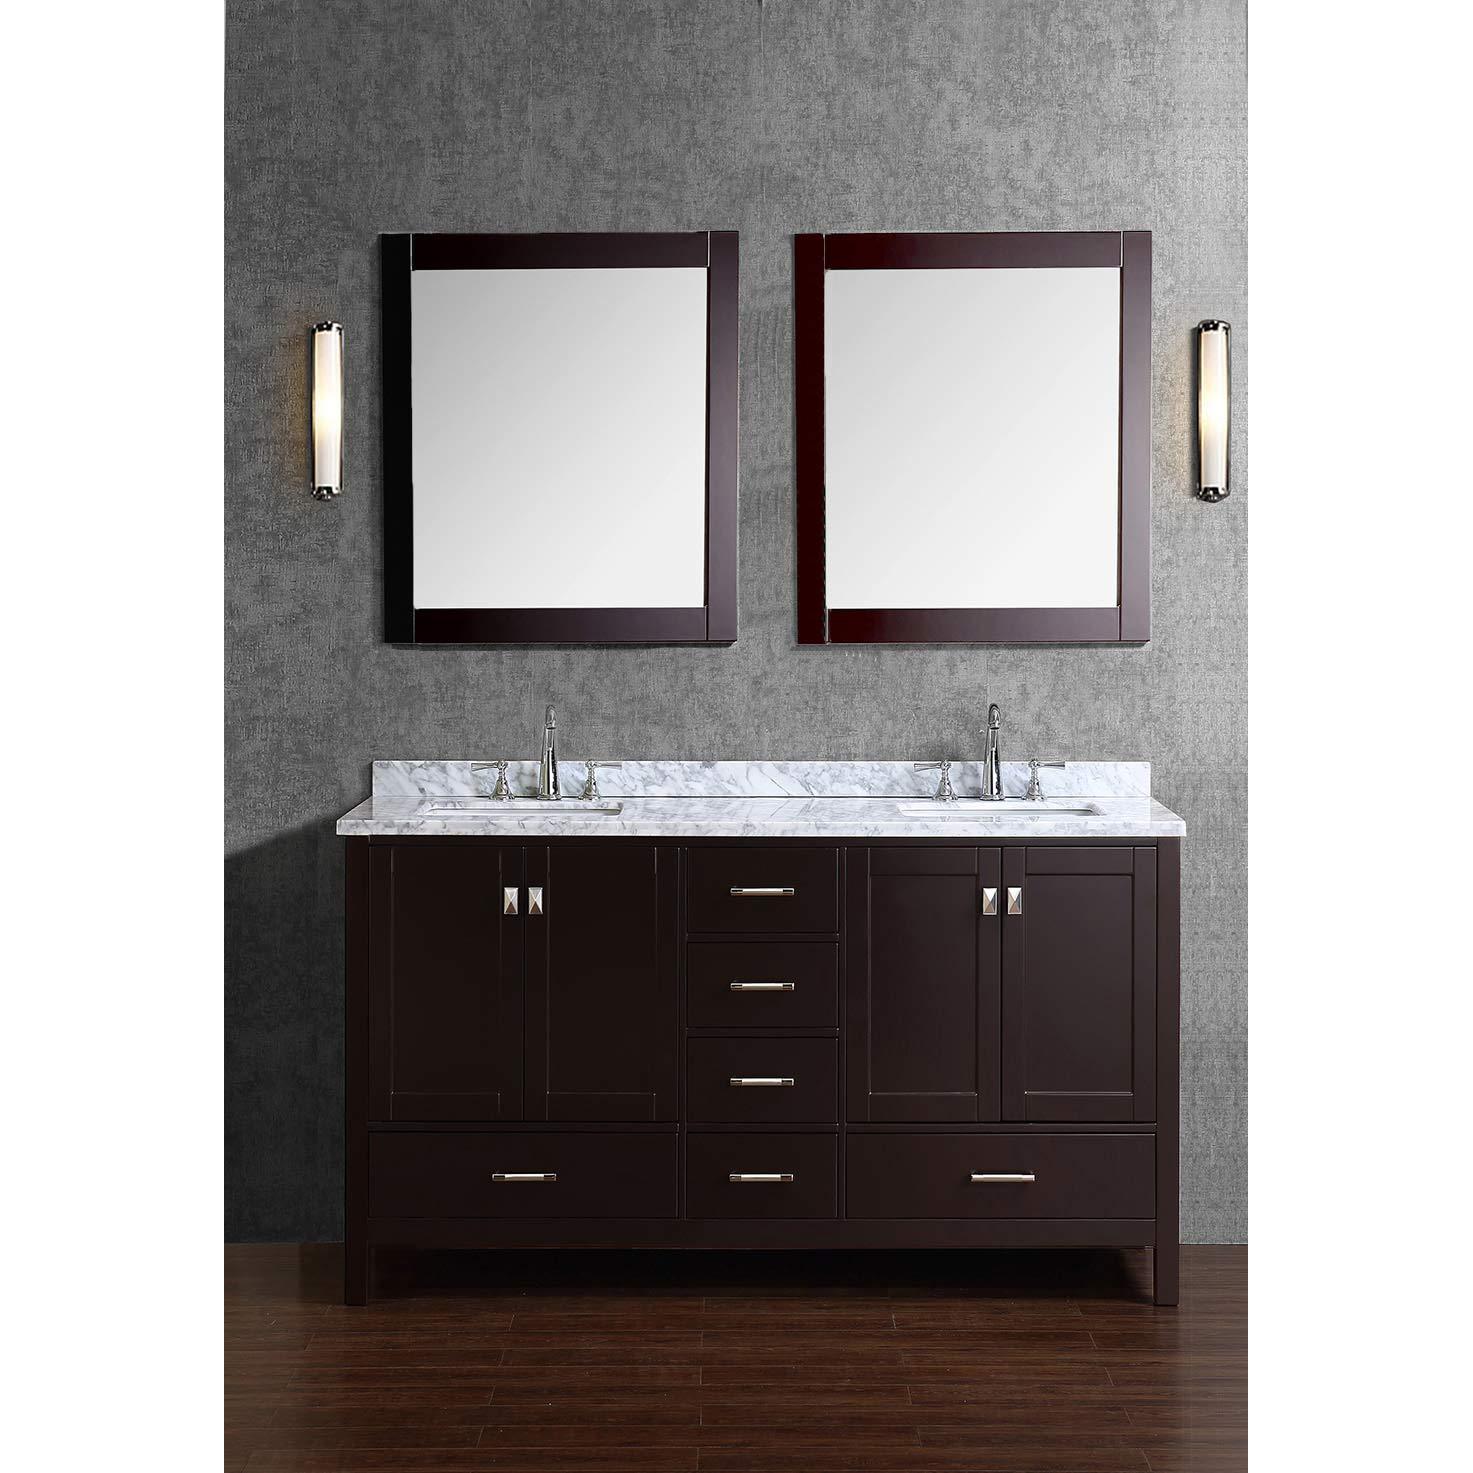 "Bathroom Cabinets Espresso buy vnicent 60"" solid wood double bathroom vanity in espresso hm"